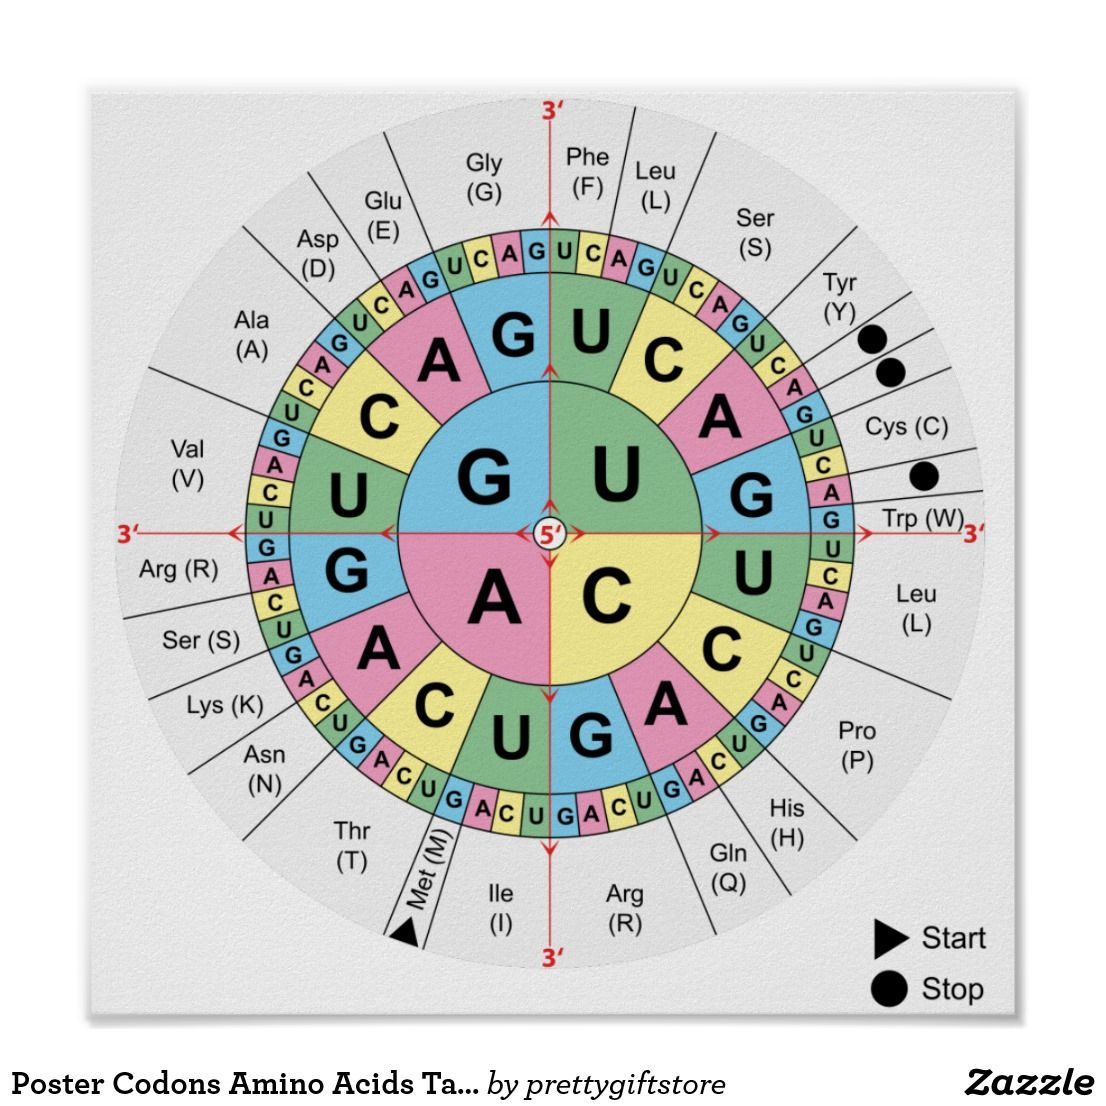 Poster Codons Amino Acids Table Genetic Code Dna